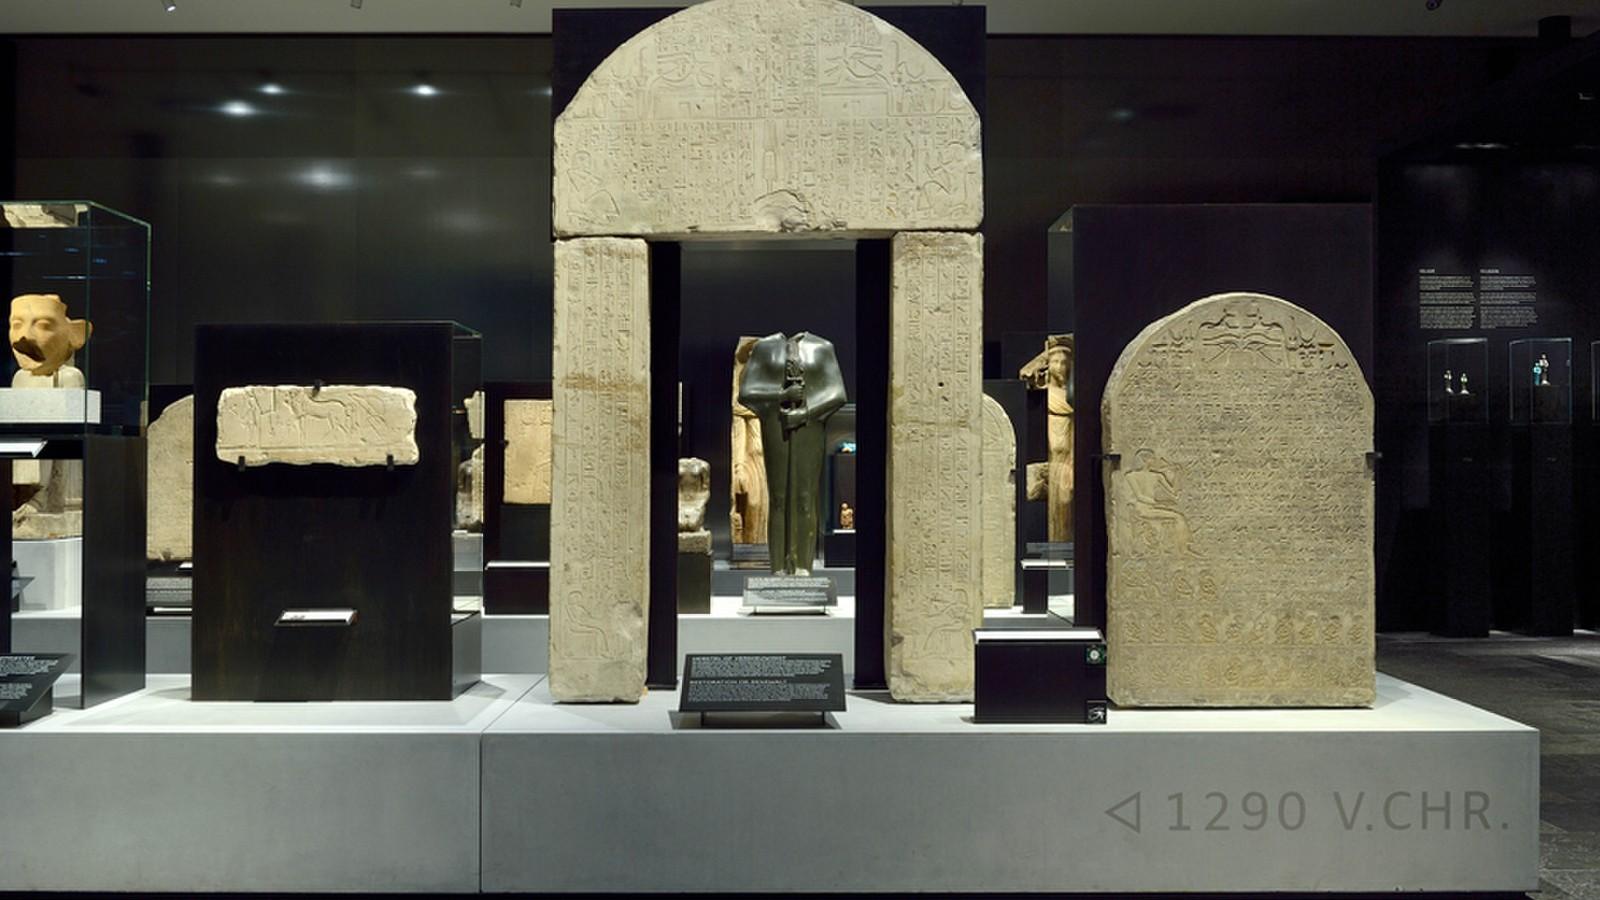 Rijksmuseum van Oudheden | Tentoonstelling Egypte | Ontwerp: Kinkorn